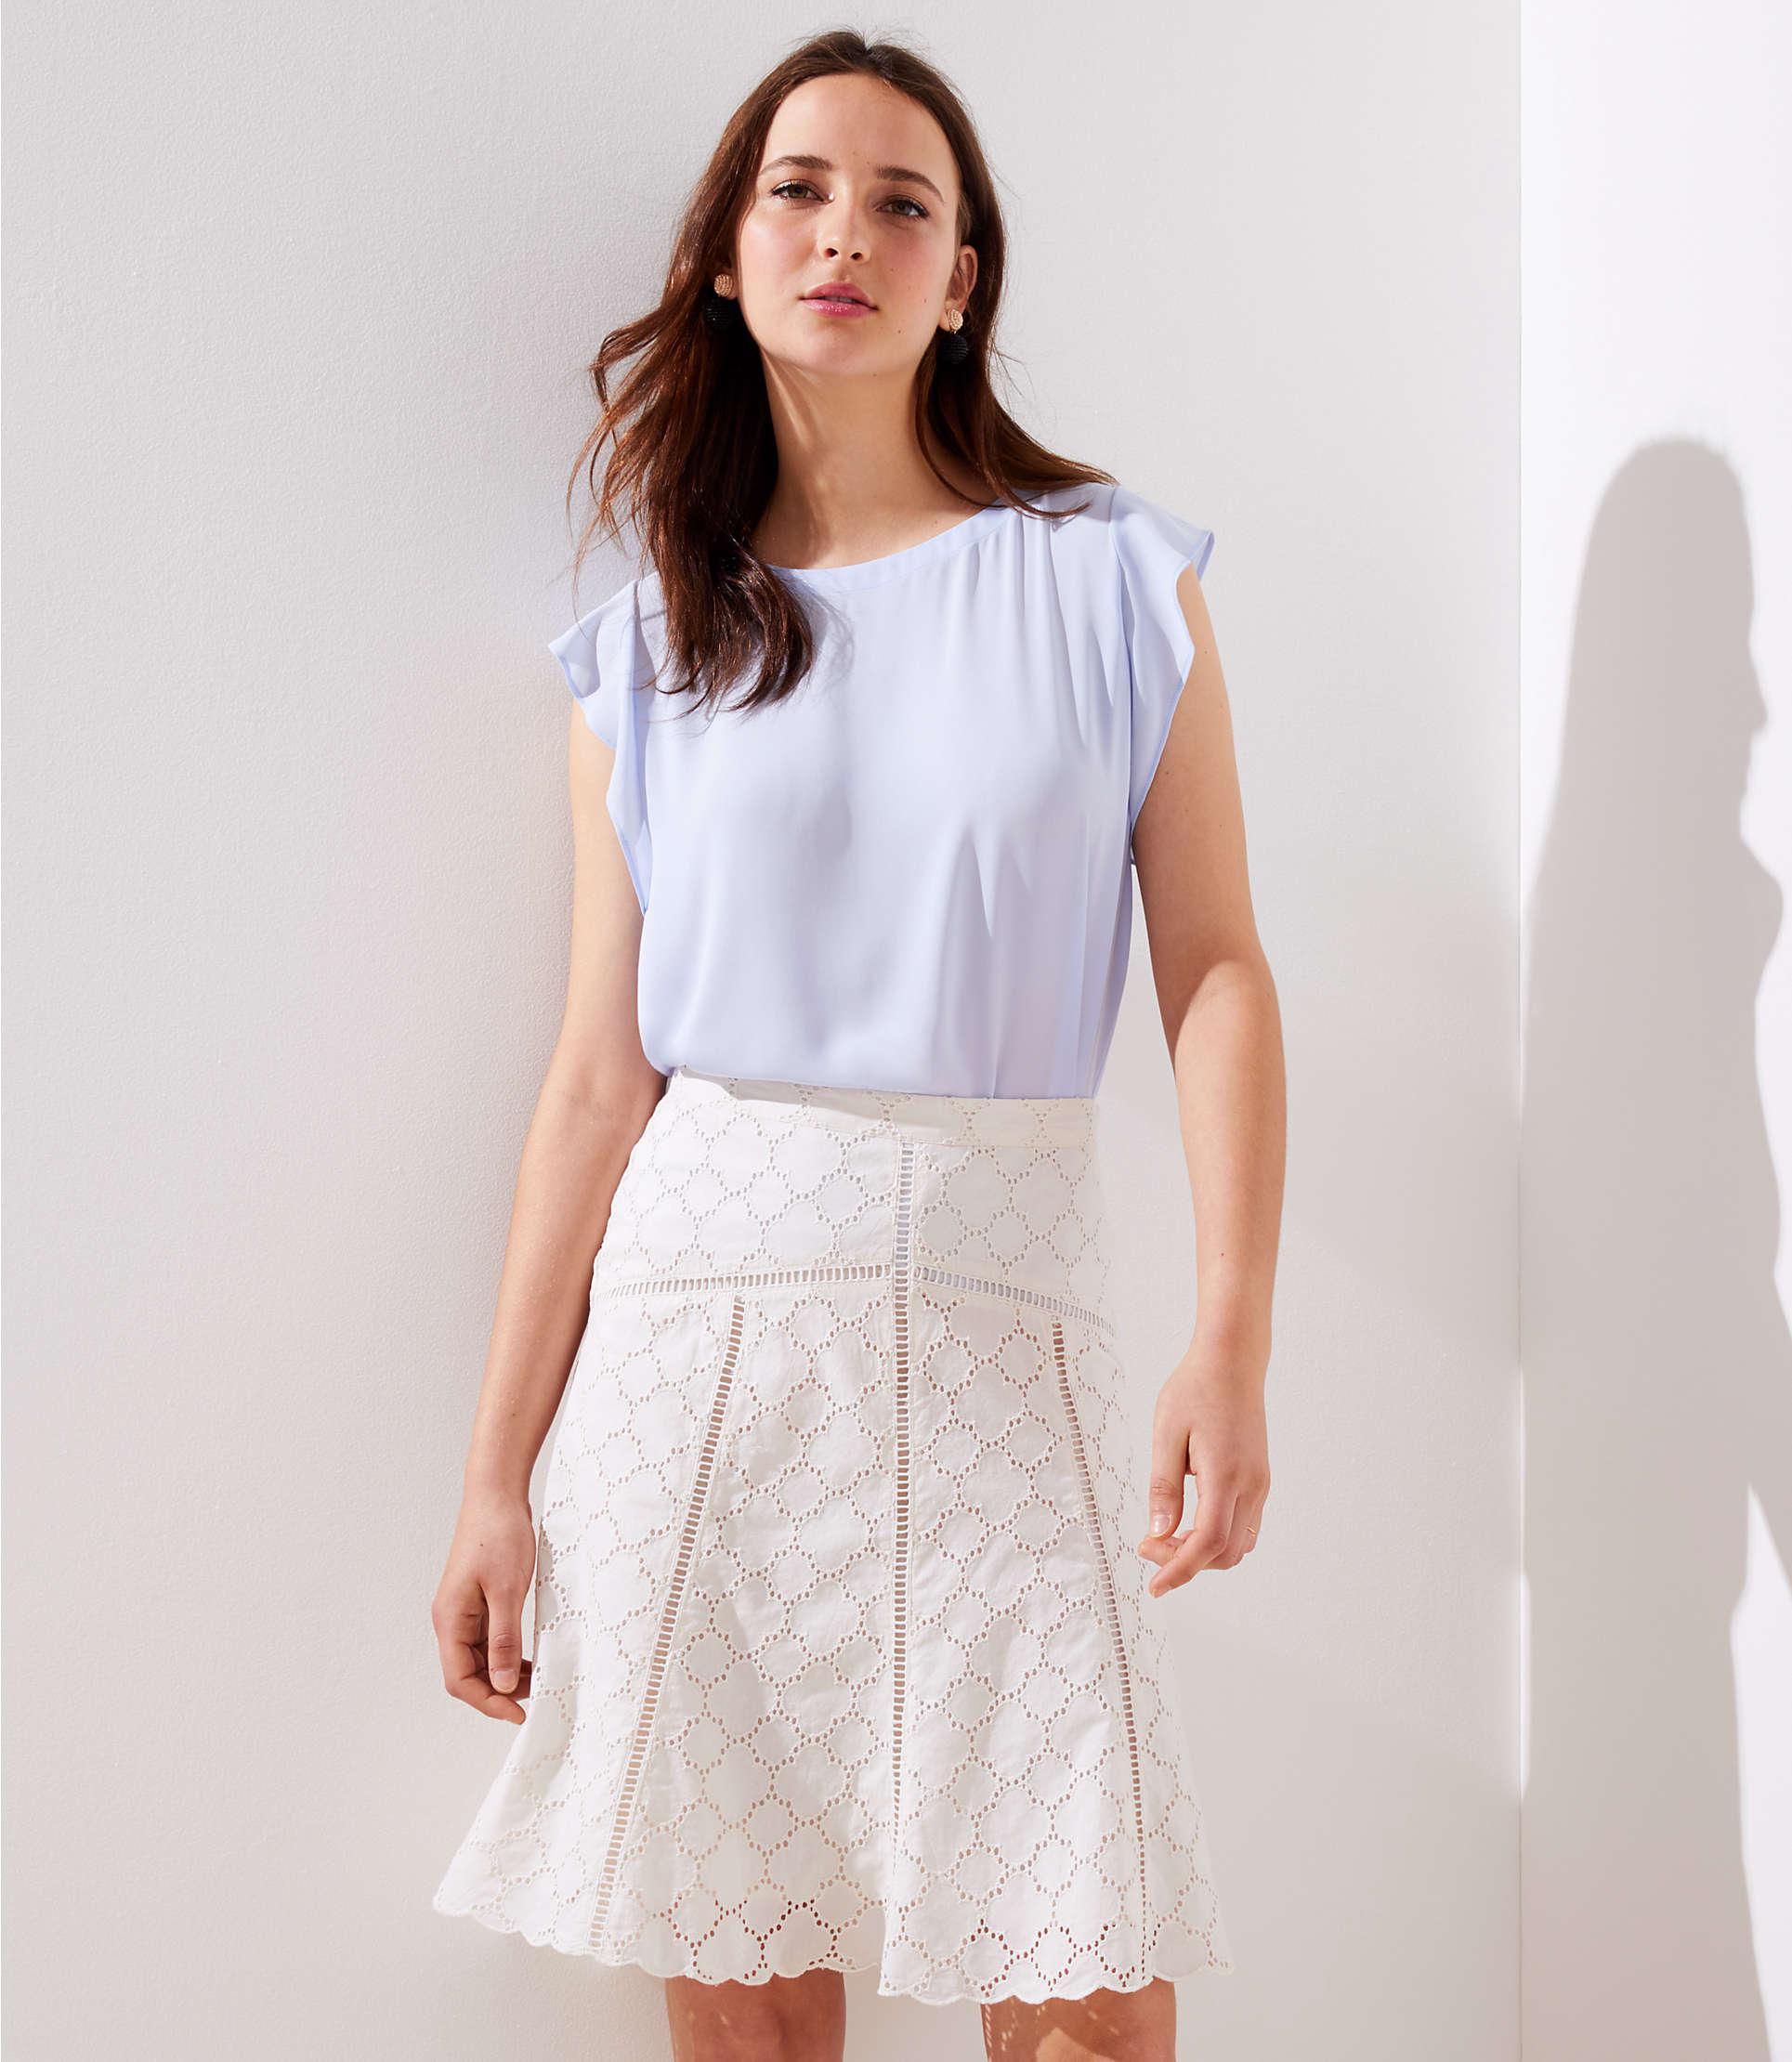 4571acc5a4 LOFT Petite Cutout Eyelet Skirt in White - Lyst